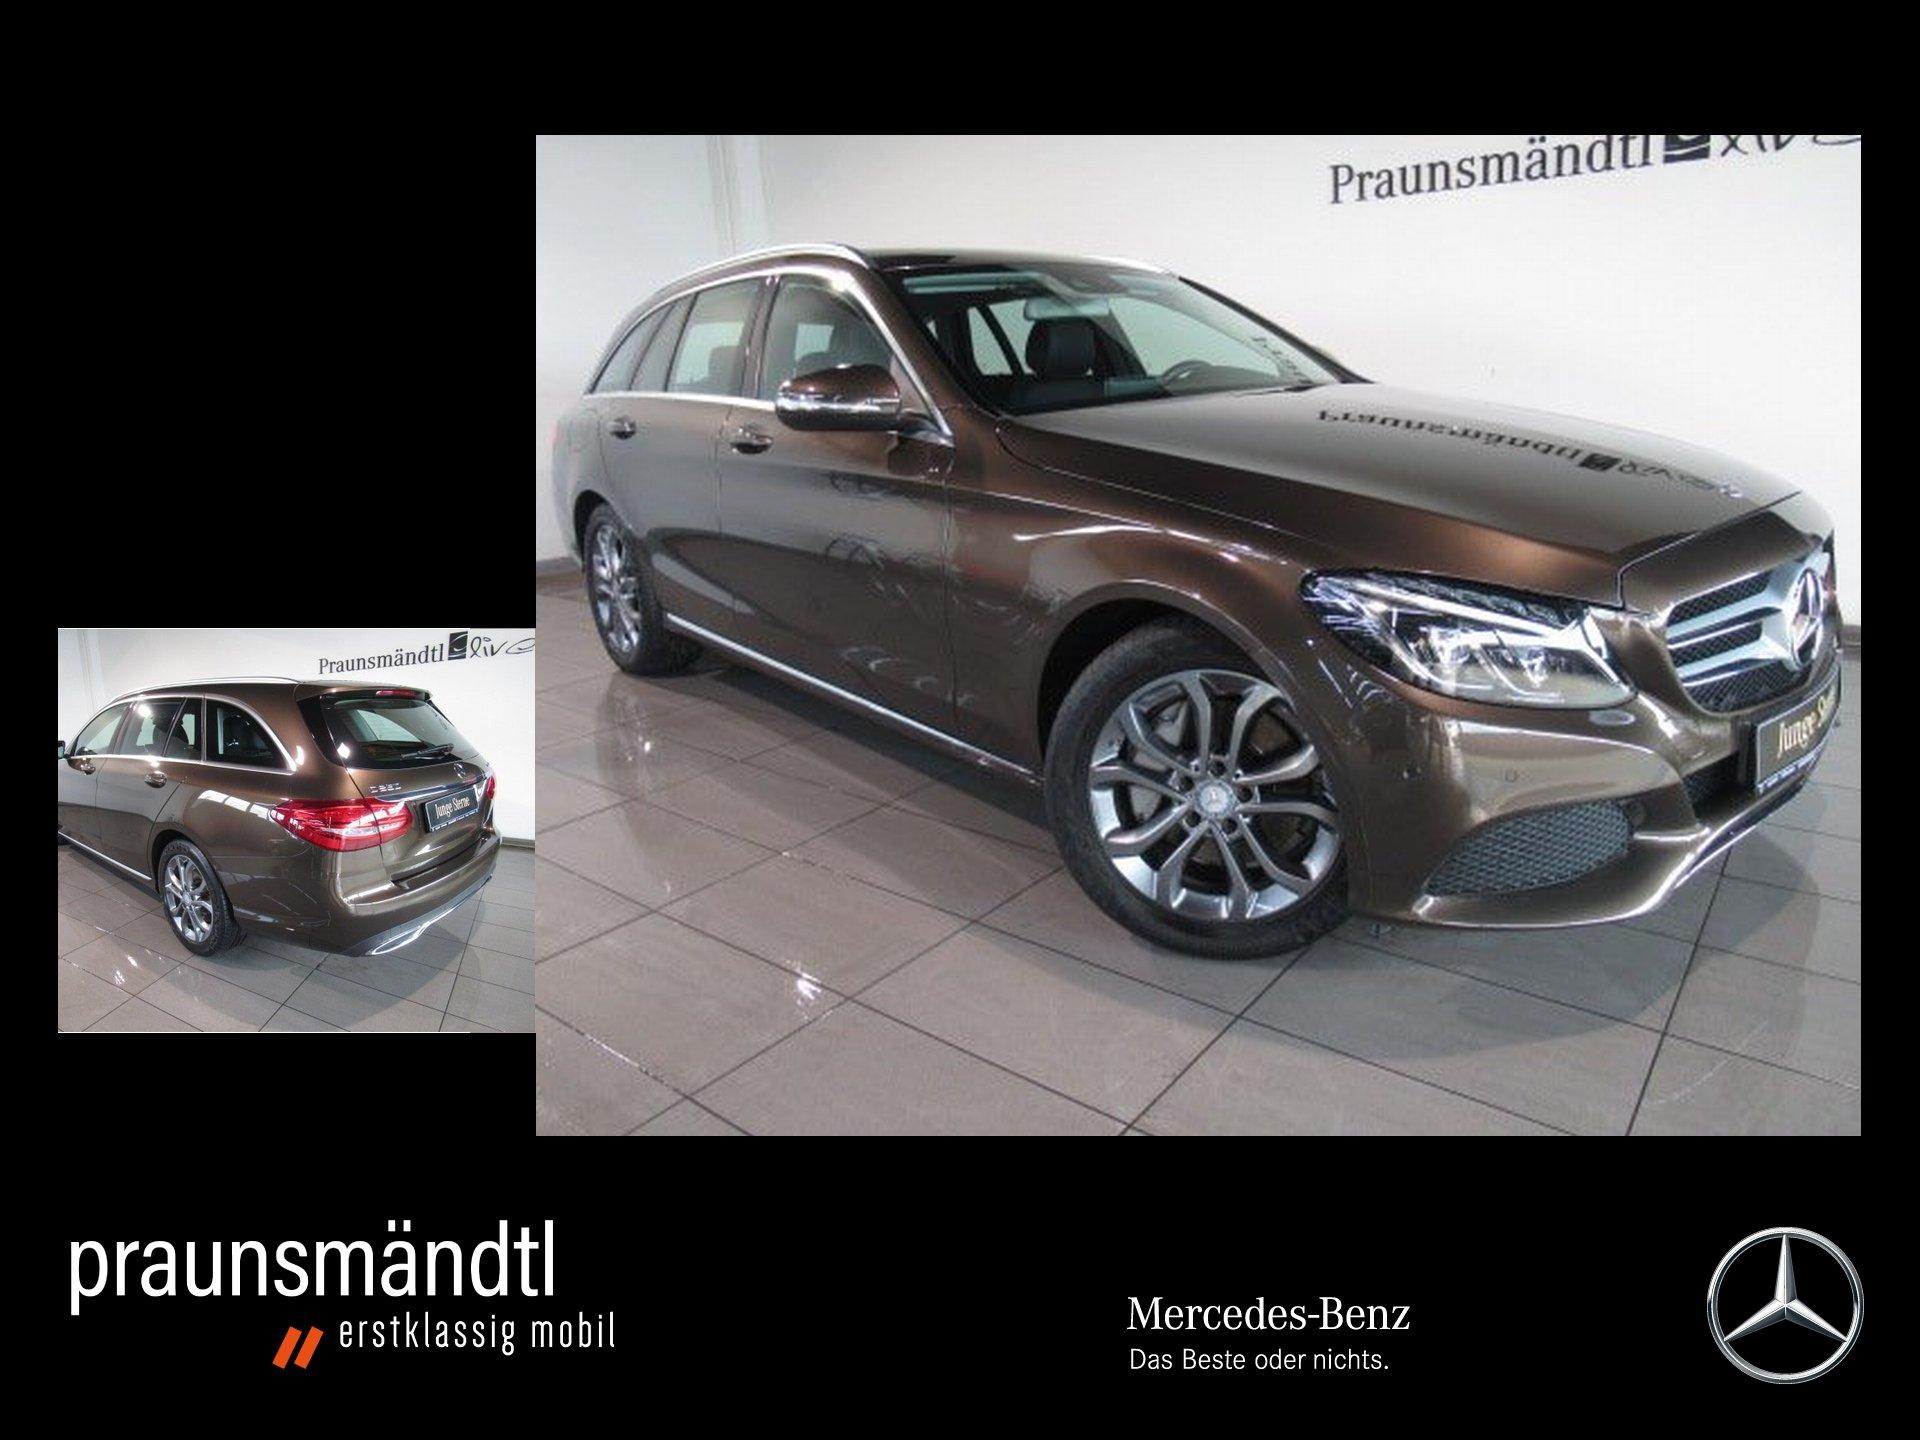 Mercedes-Benz C 250 T BT Avantgarde 7AG/LED/Kamera/Navi portab, Jahr 2015, Diesel